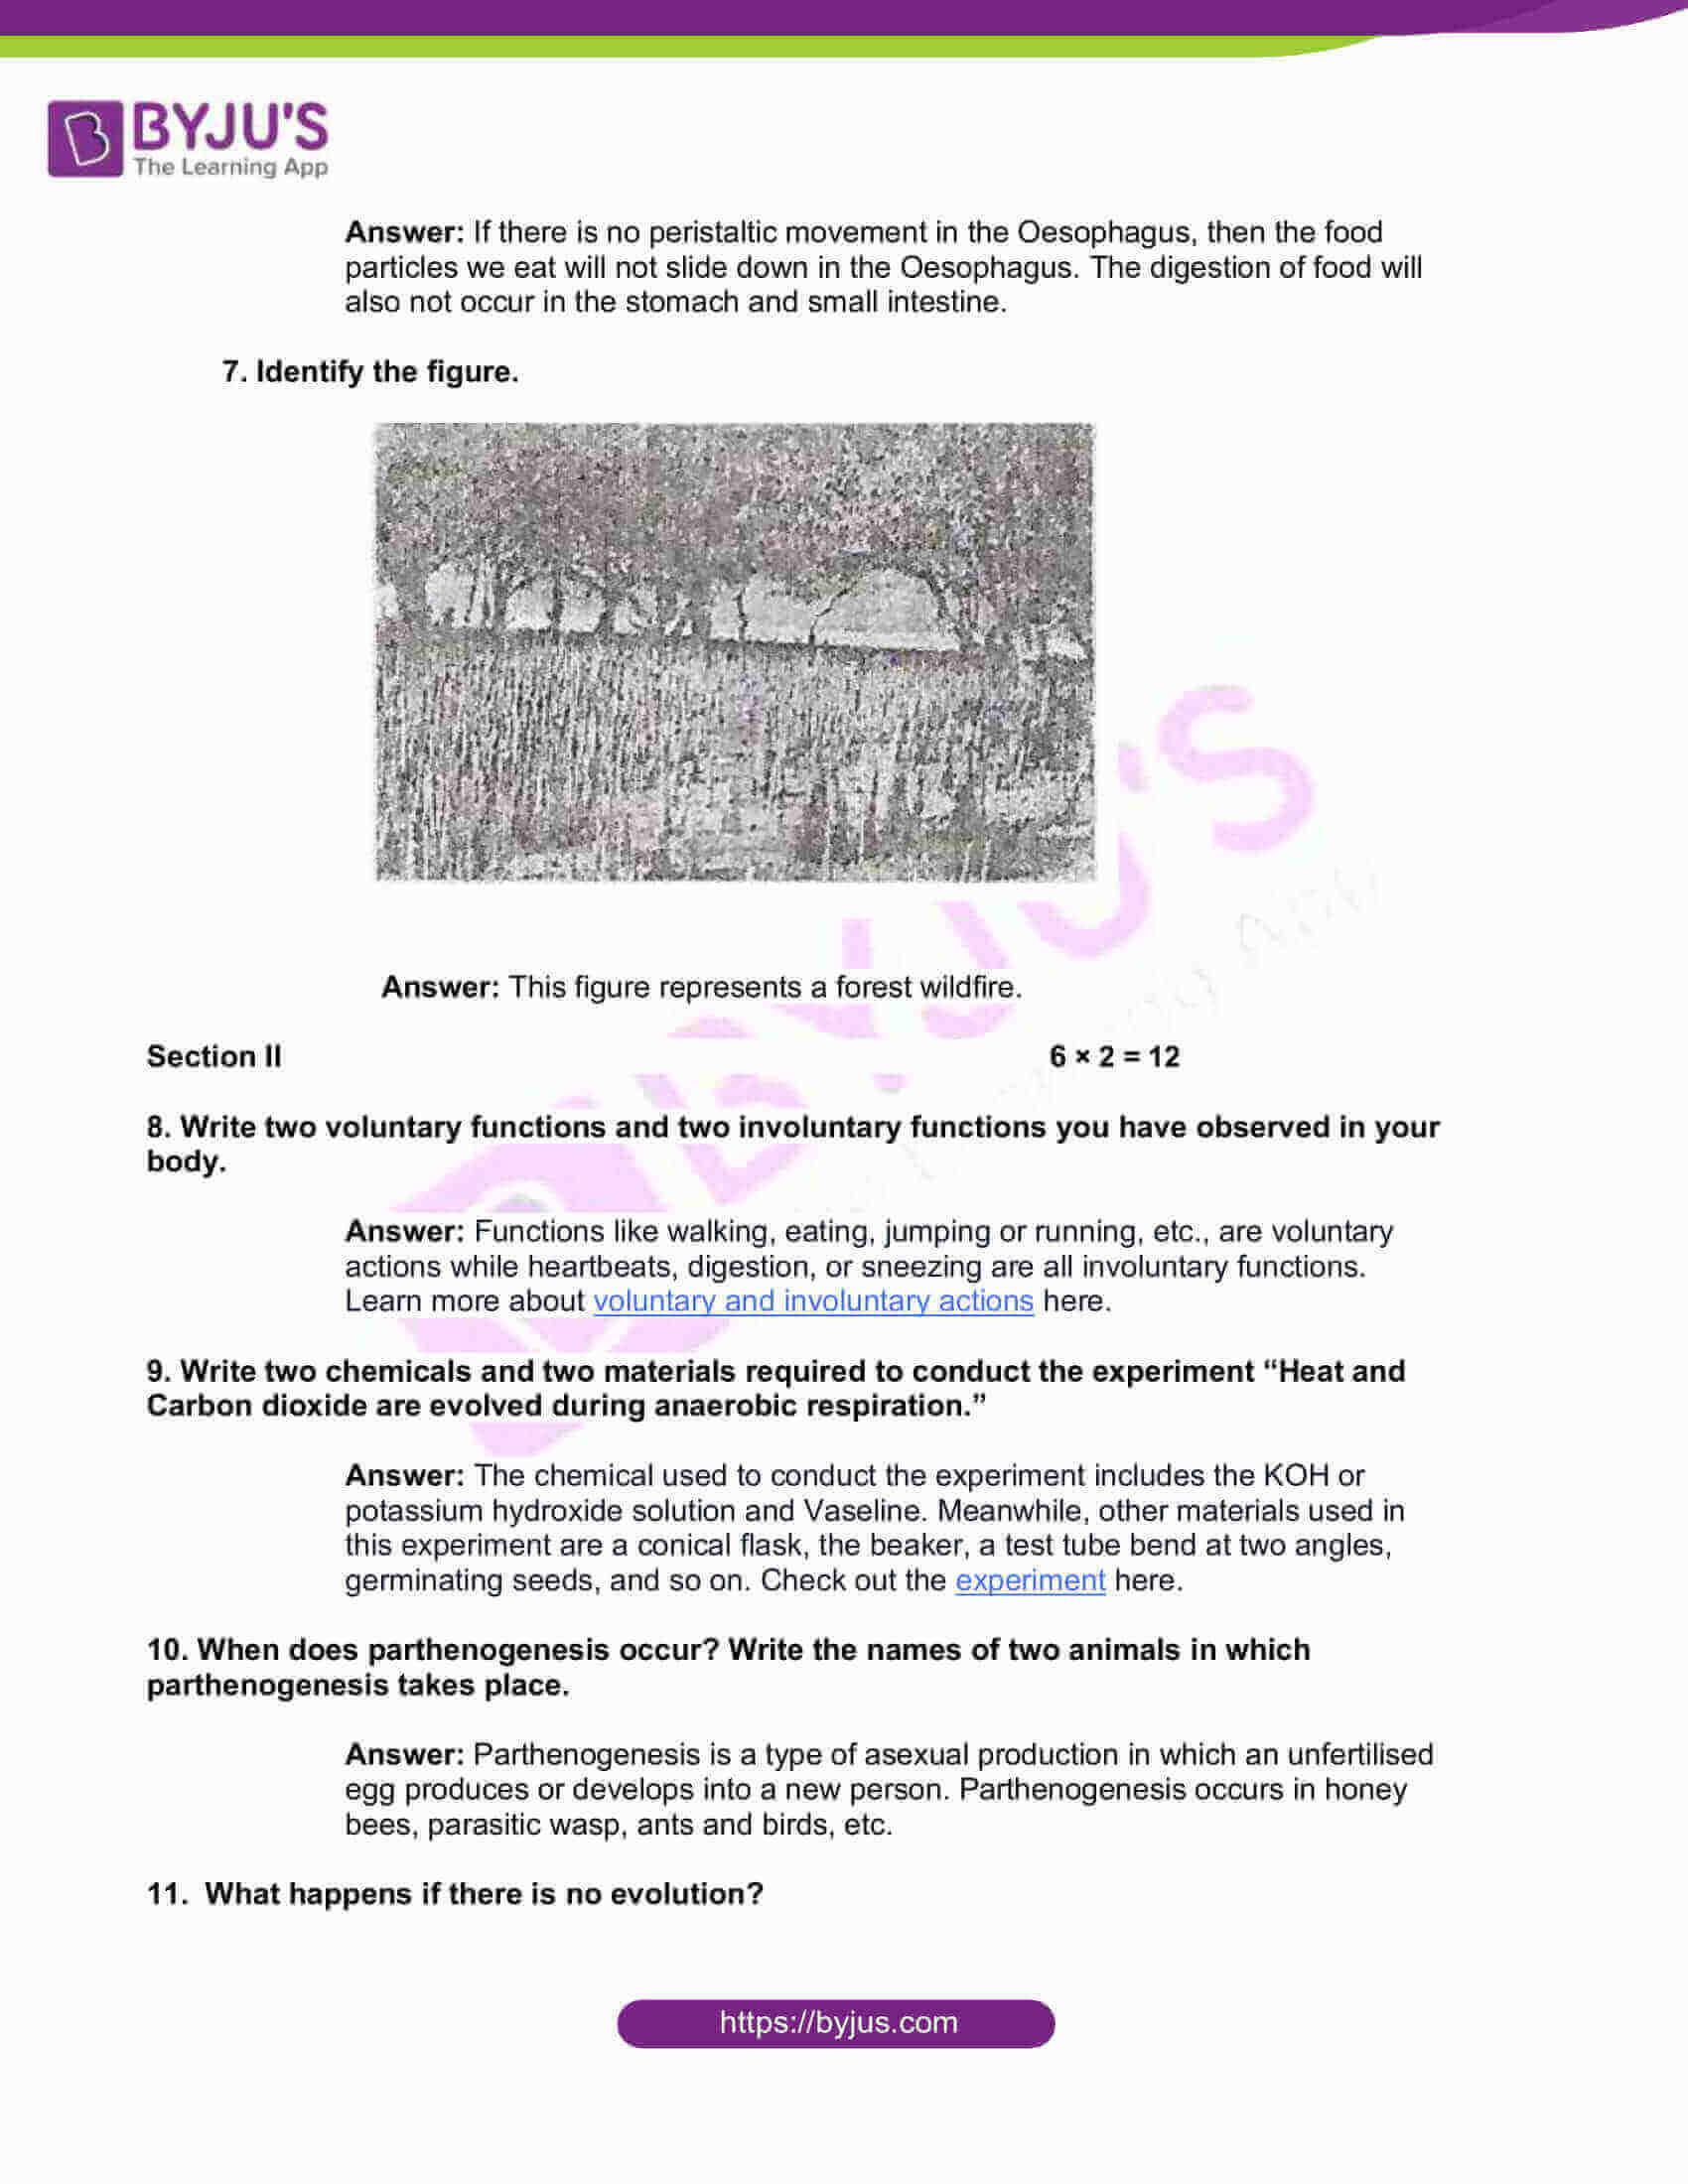 telangana board nov2020 class 10 science part ii solutions 2019 2